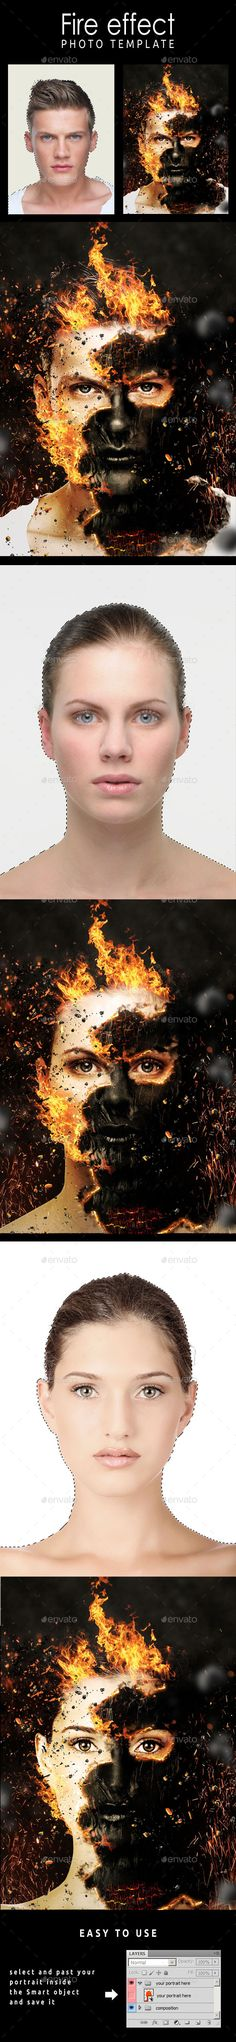 Fire Effect Photo Template #design Download: http://graphicriver.net/item/fire-effect-photo-template/11108155?ref=ksioks